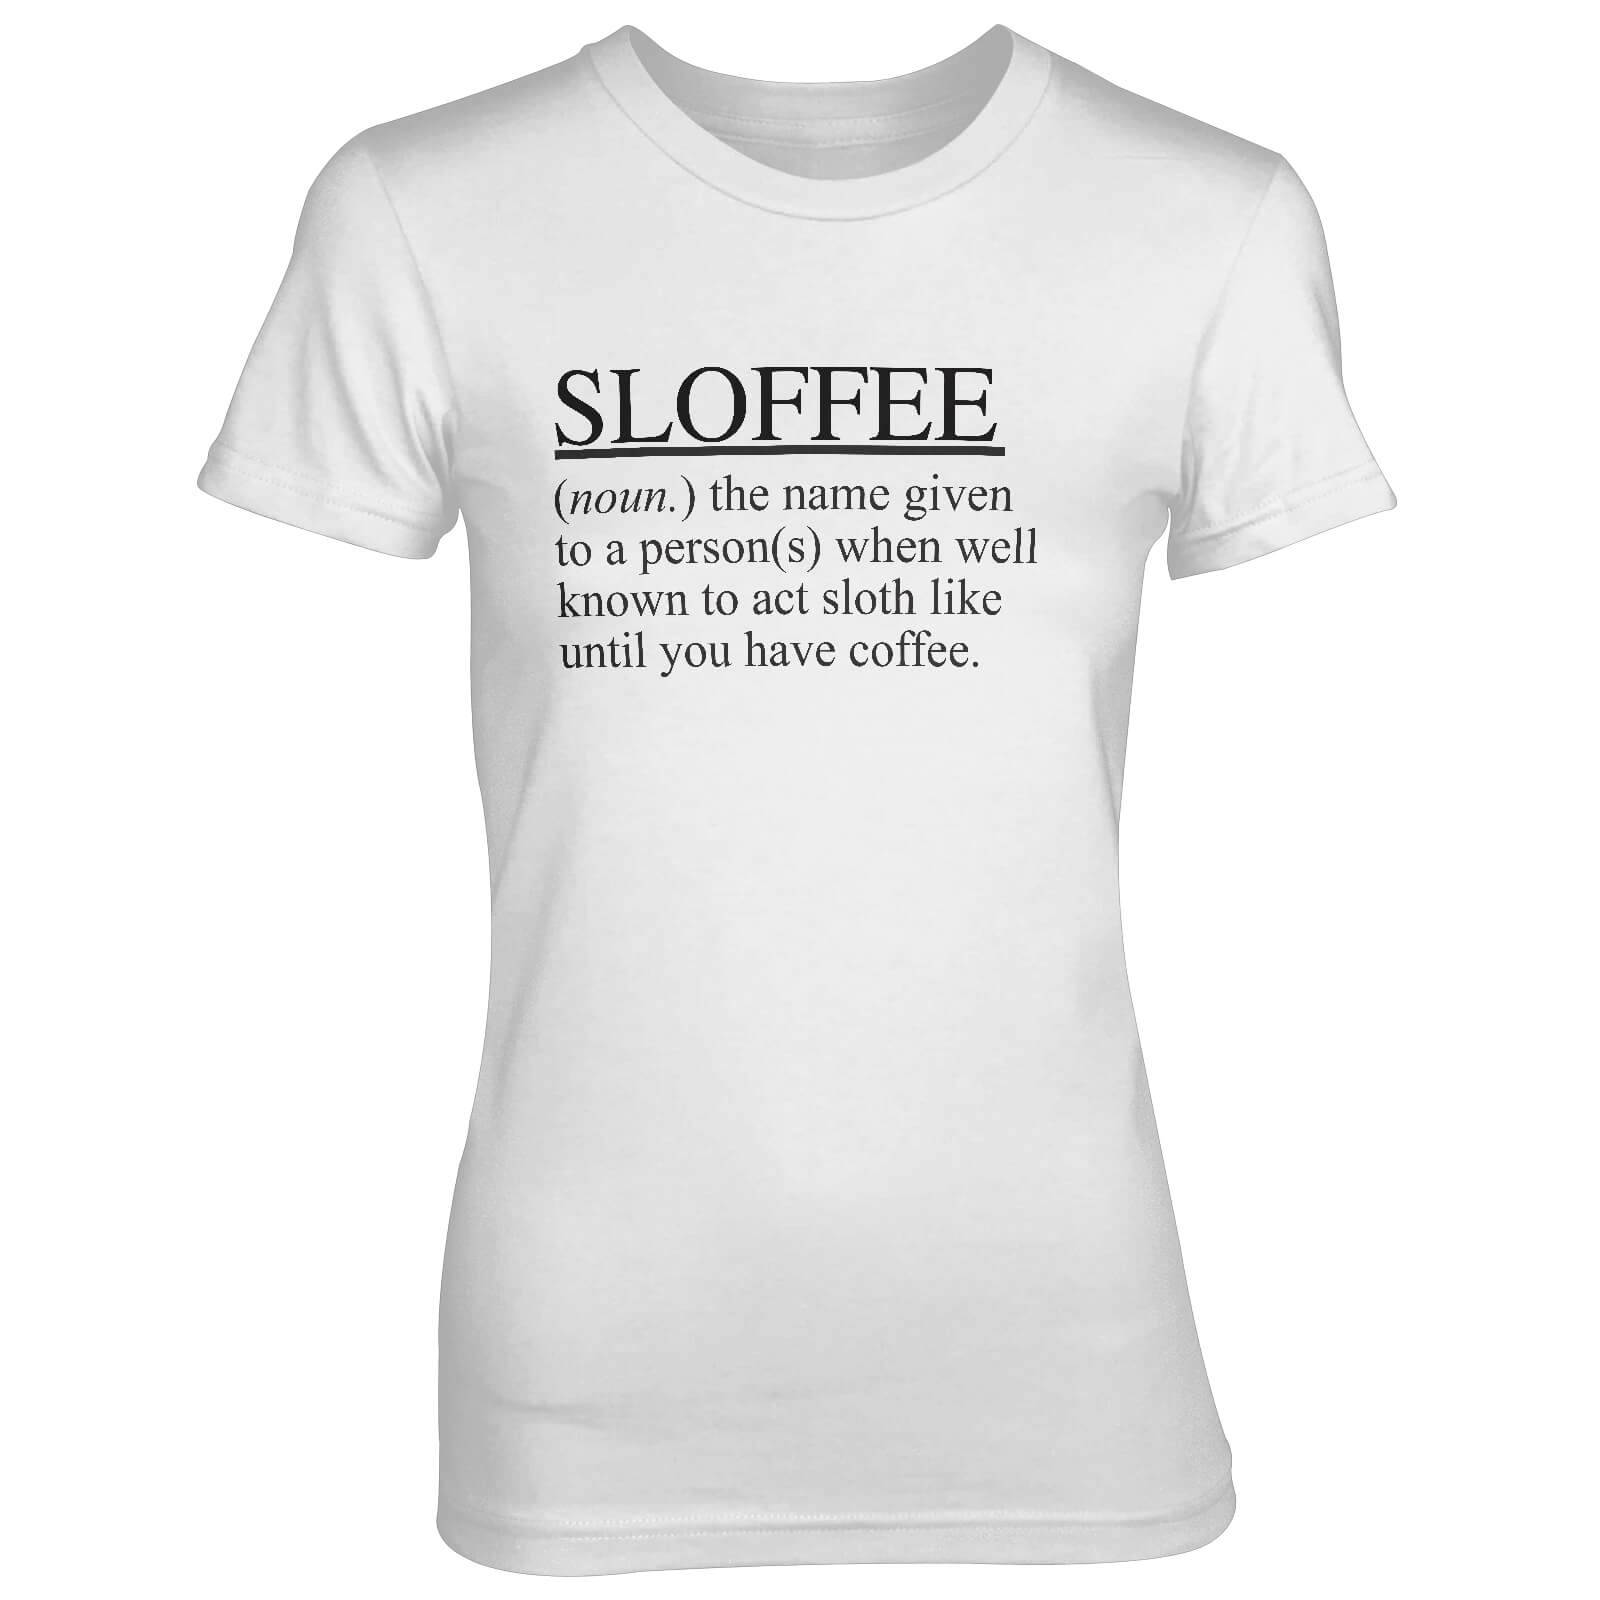 T-Junkie Sloffee Women's White T-Shirt - XXL - White